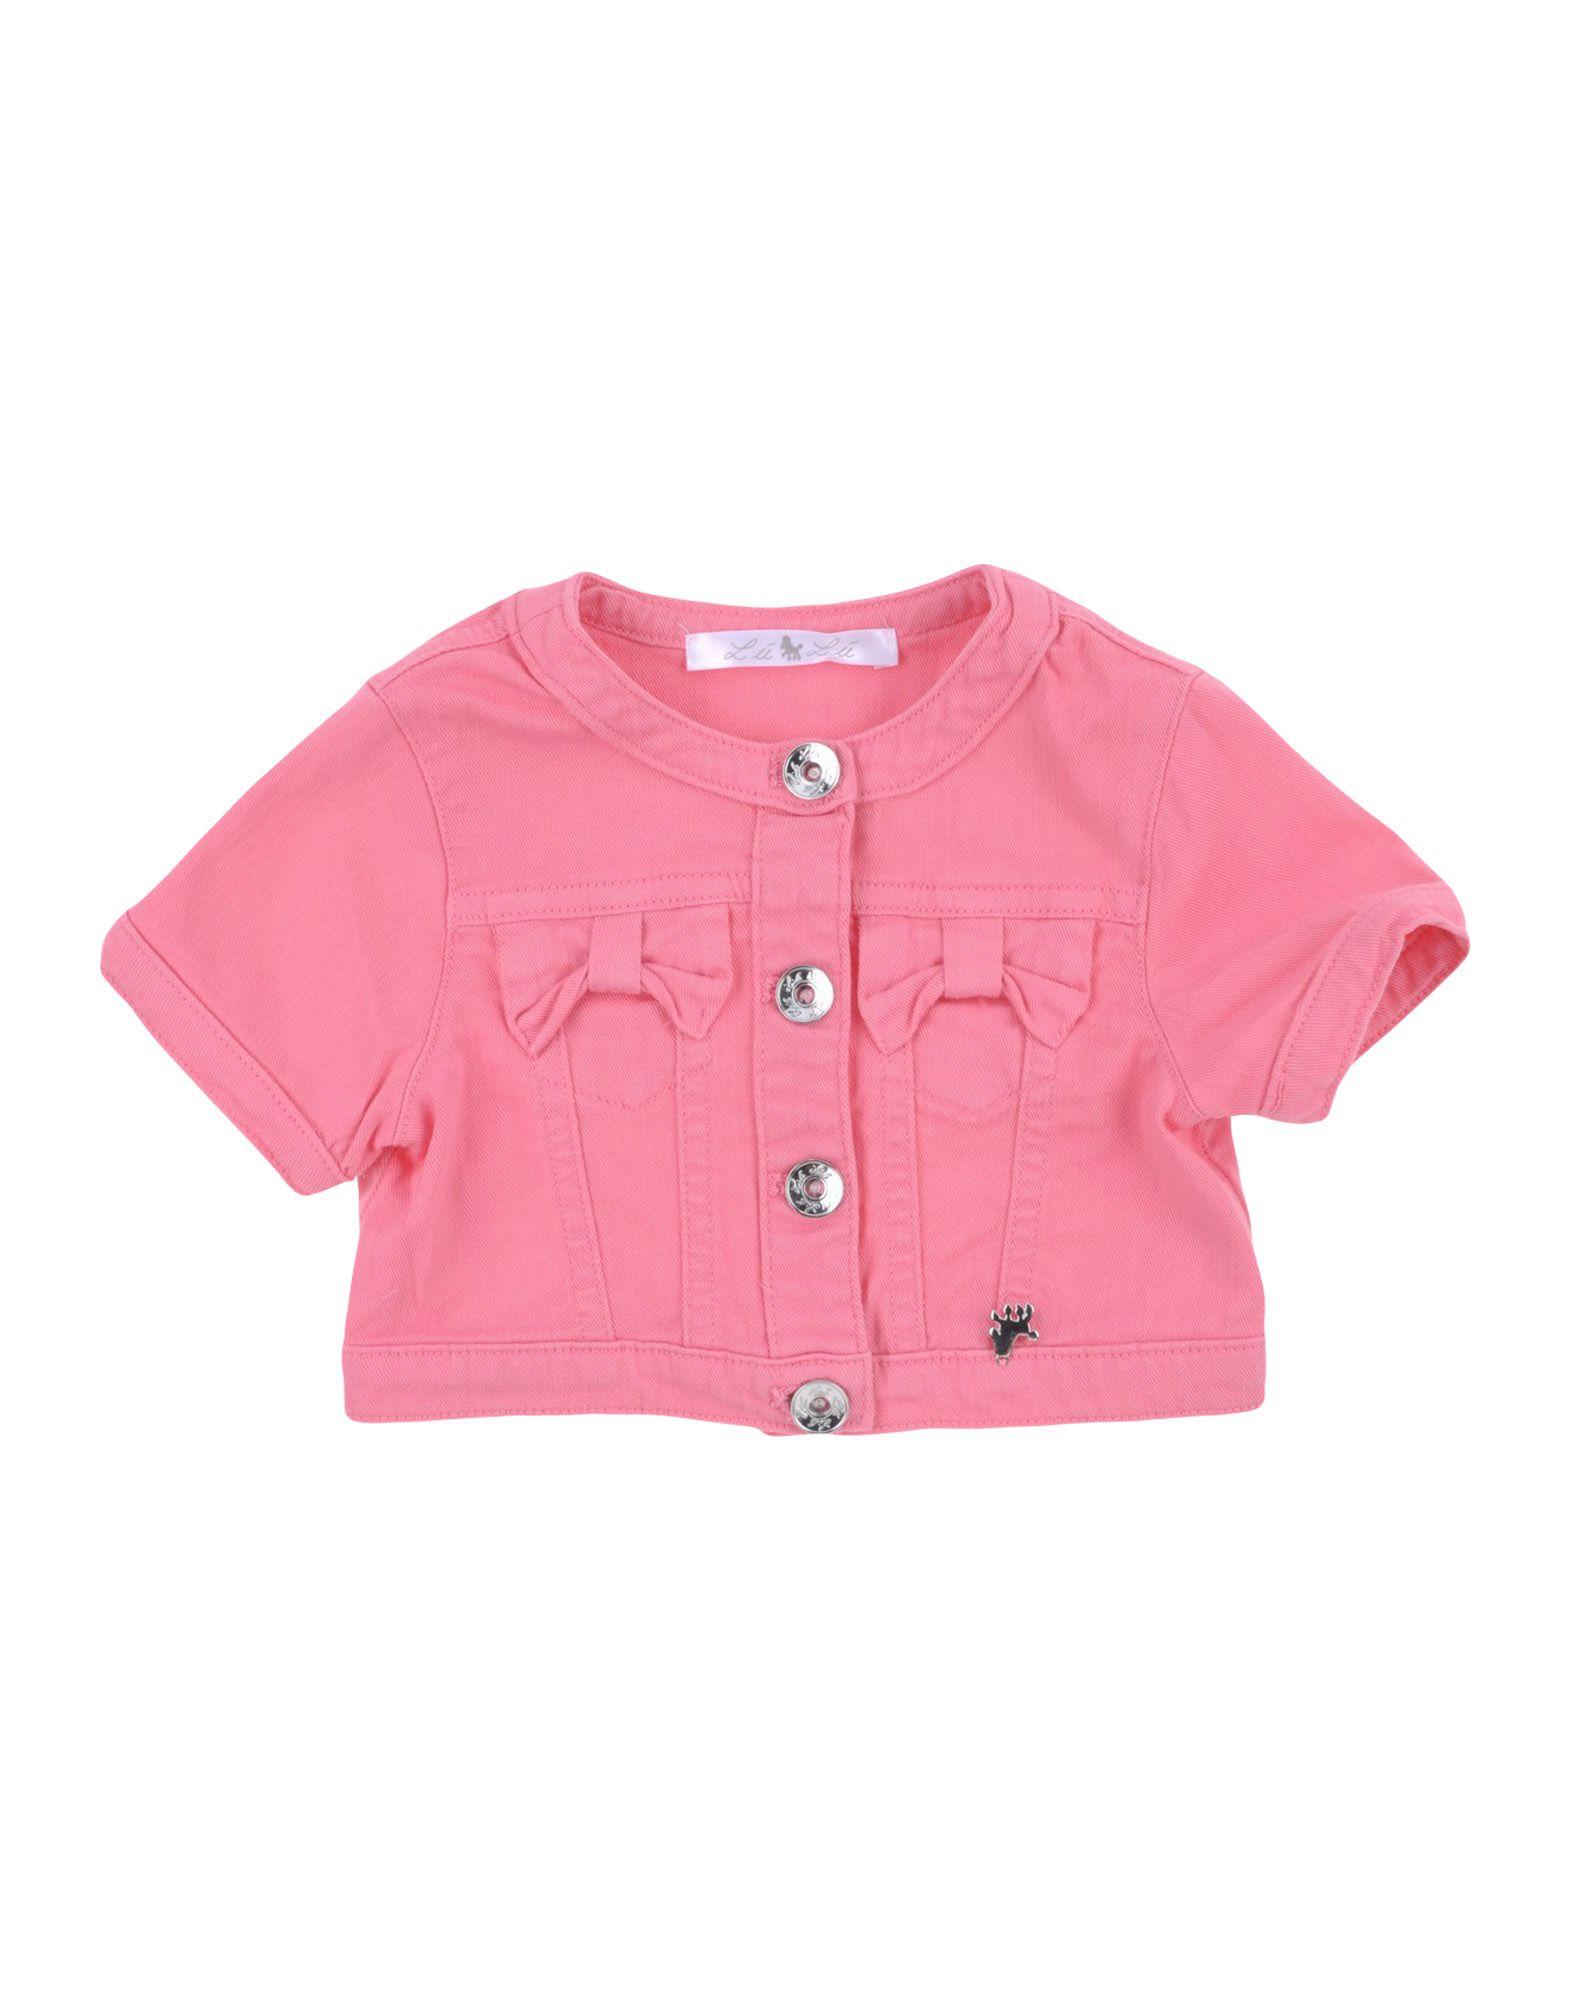 L:Ú : by MISS GRANT Джинсовая верхняя одежда